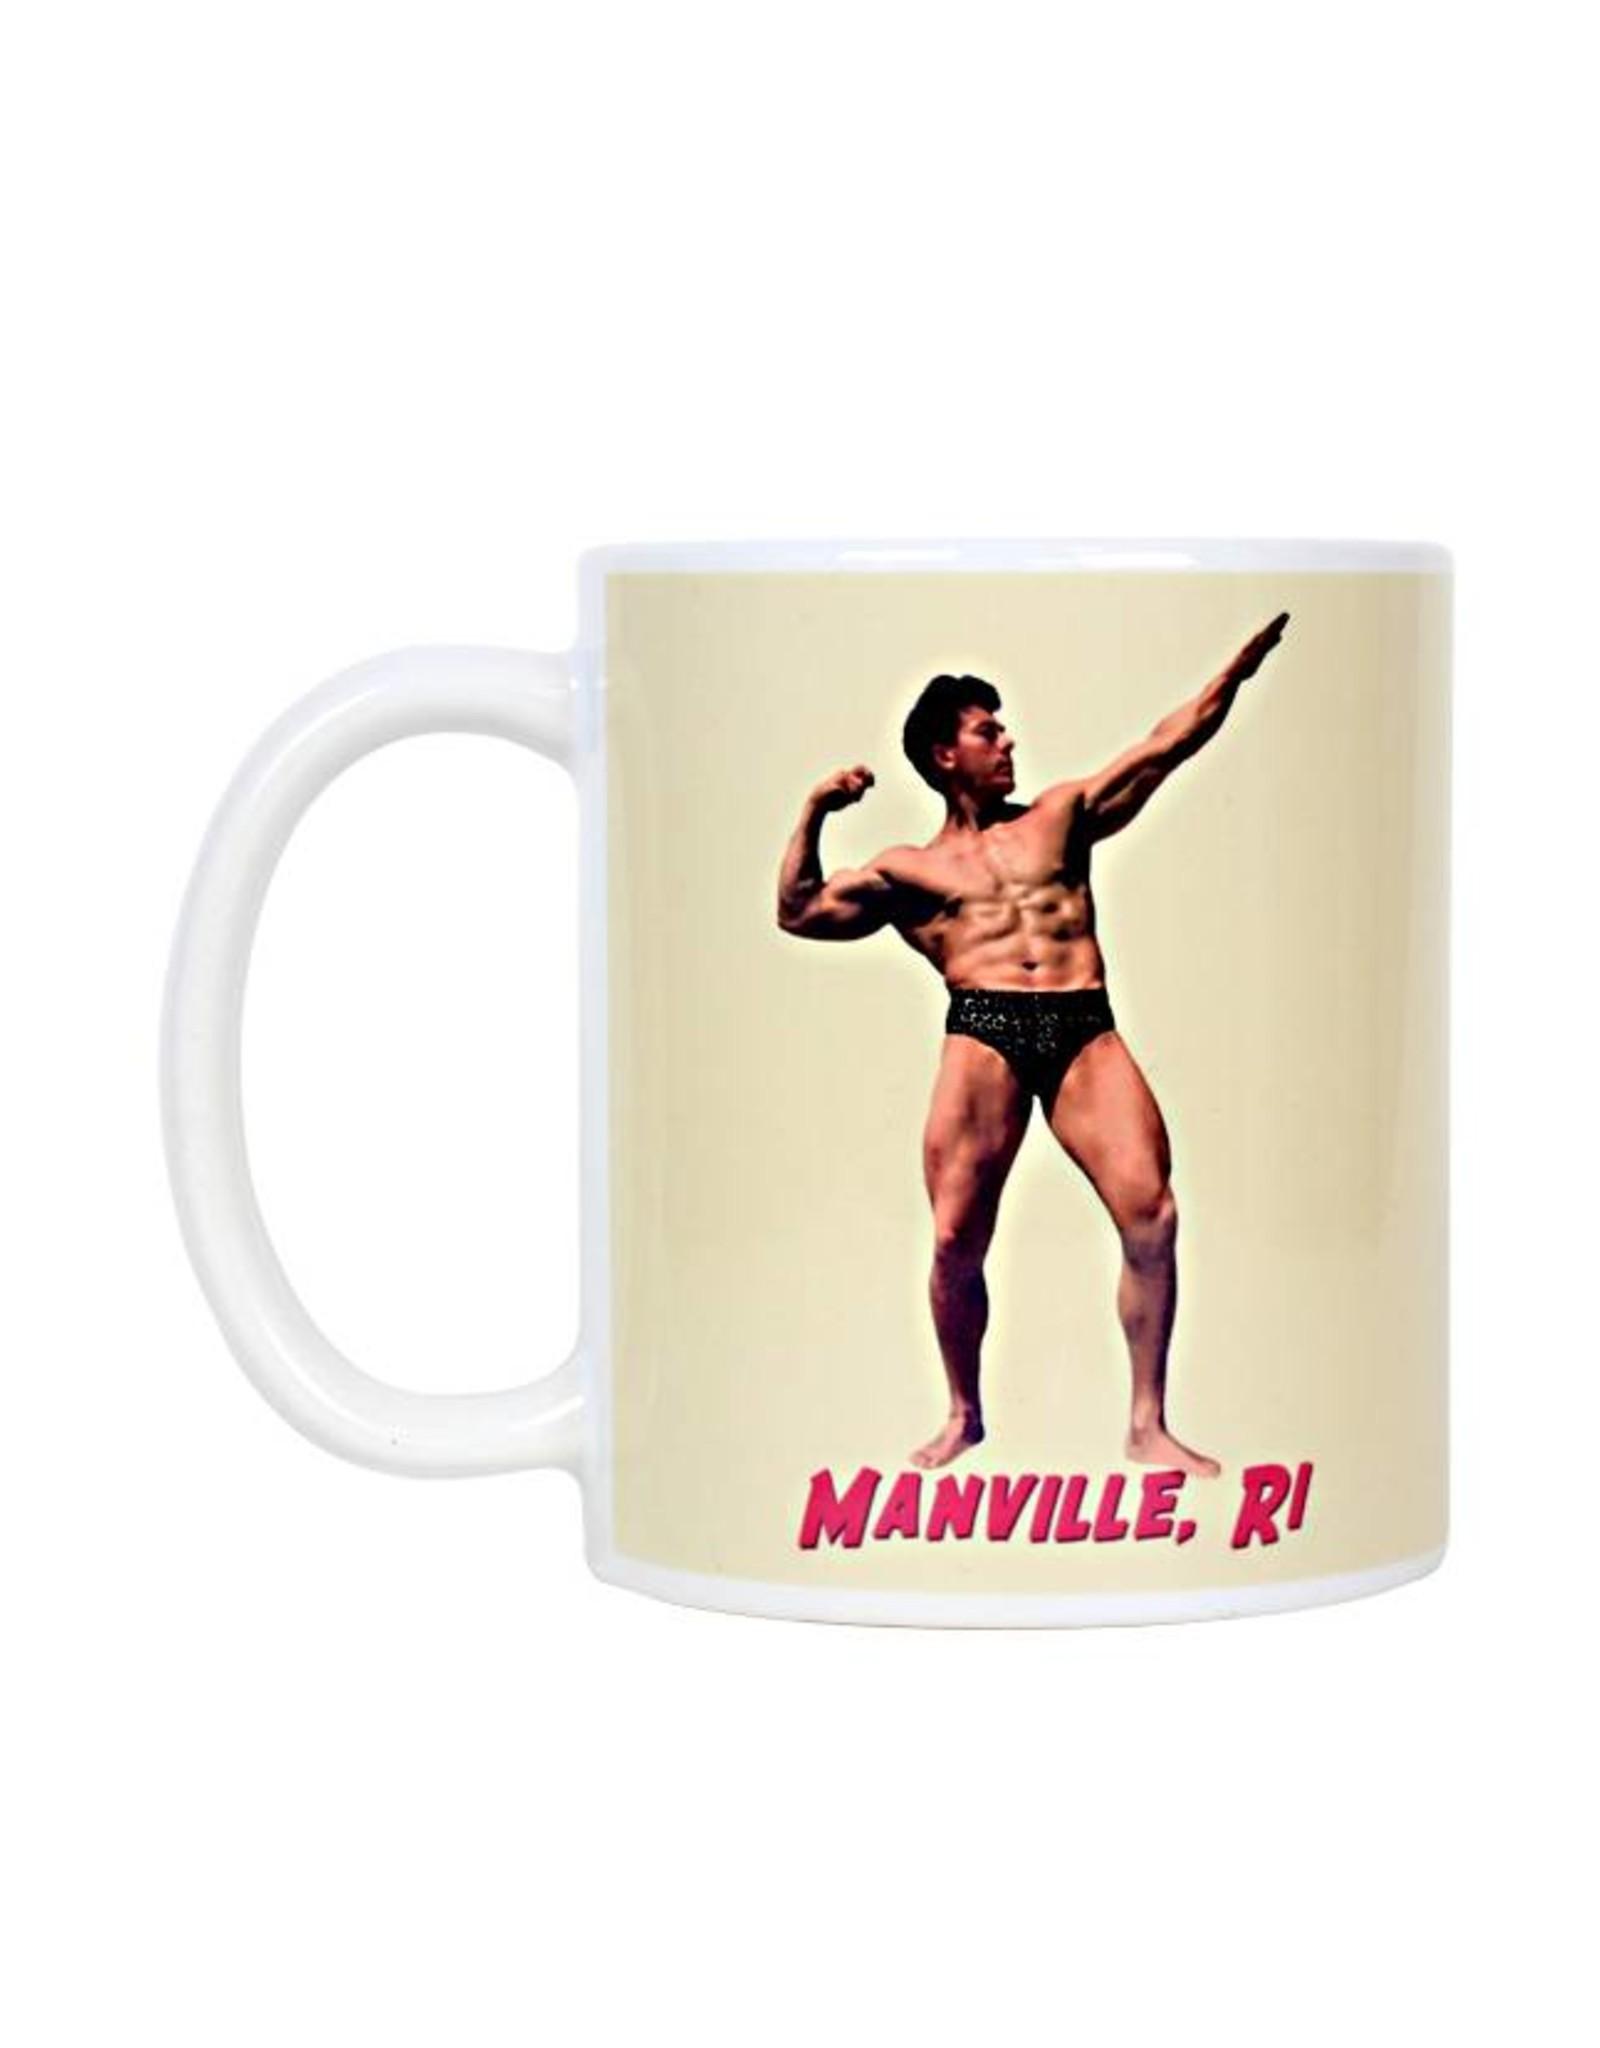 The Manville Bodybuilder Mug